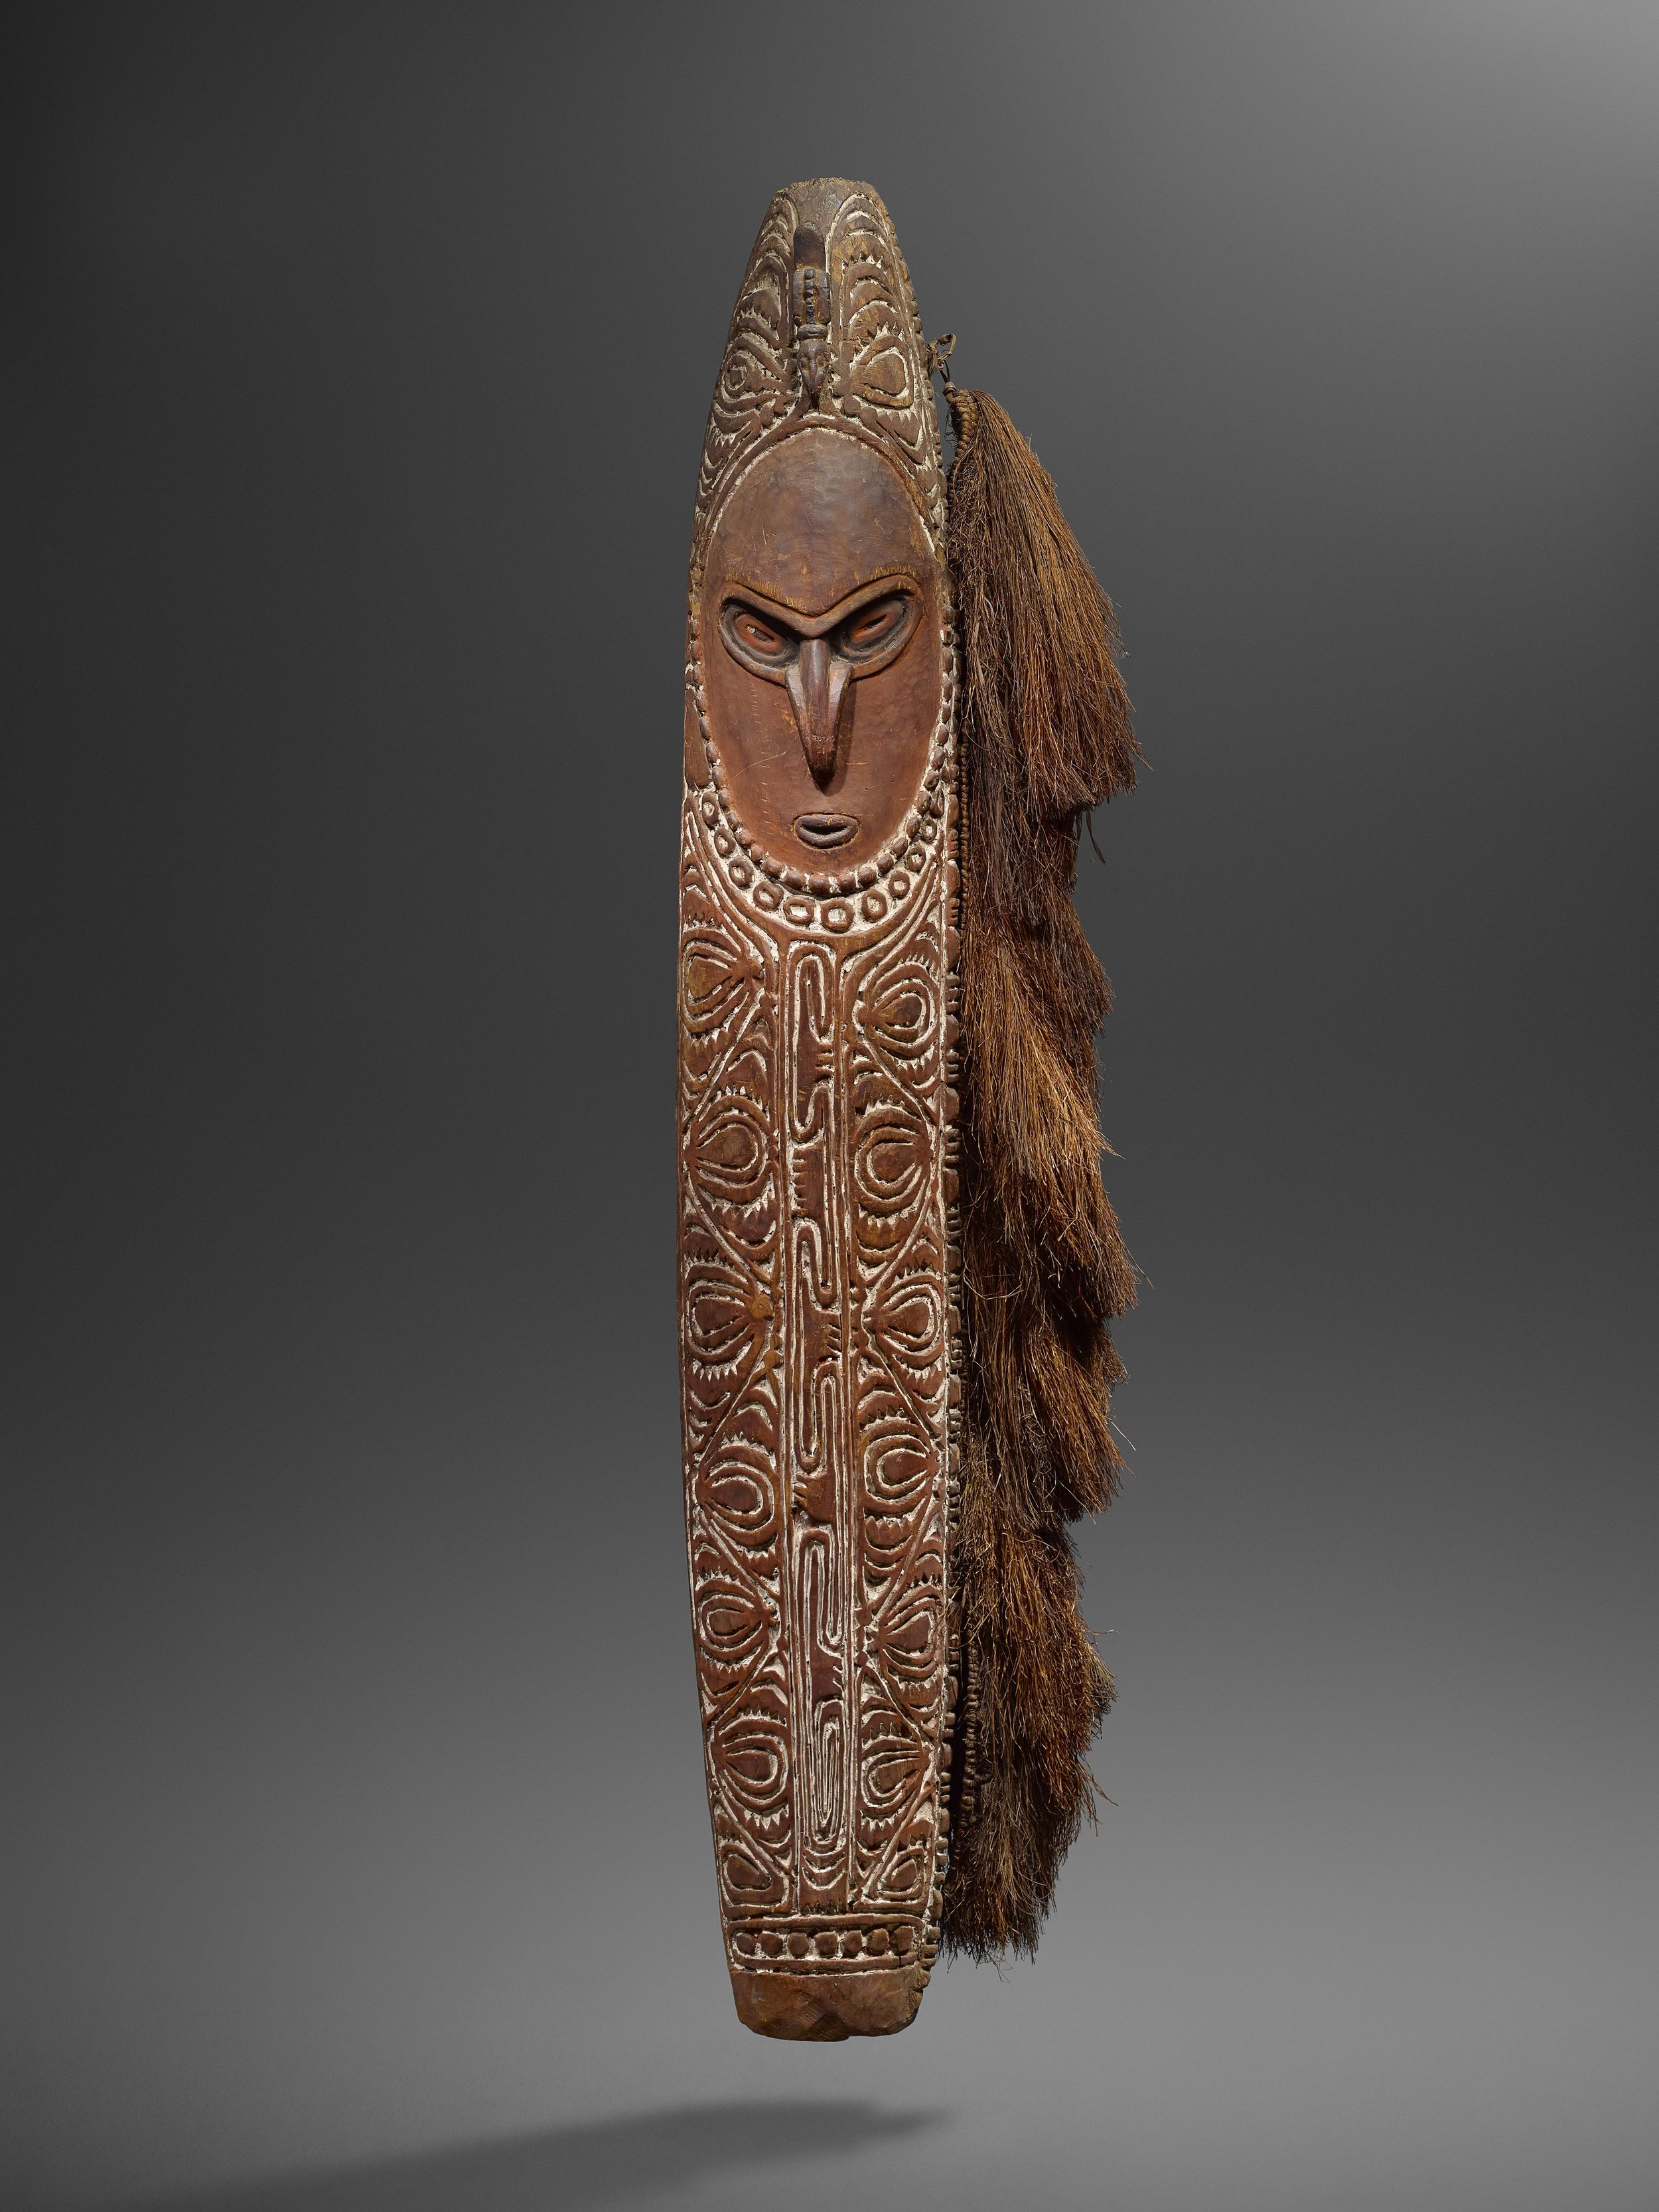 Shield. Lower Sepik or Ramu. Wood, fibre and pigments. 154 cm. Hermann Seeger, Stuttgart. © Hugues Dubois, Brussels/Paris